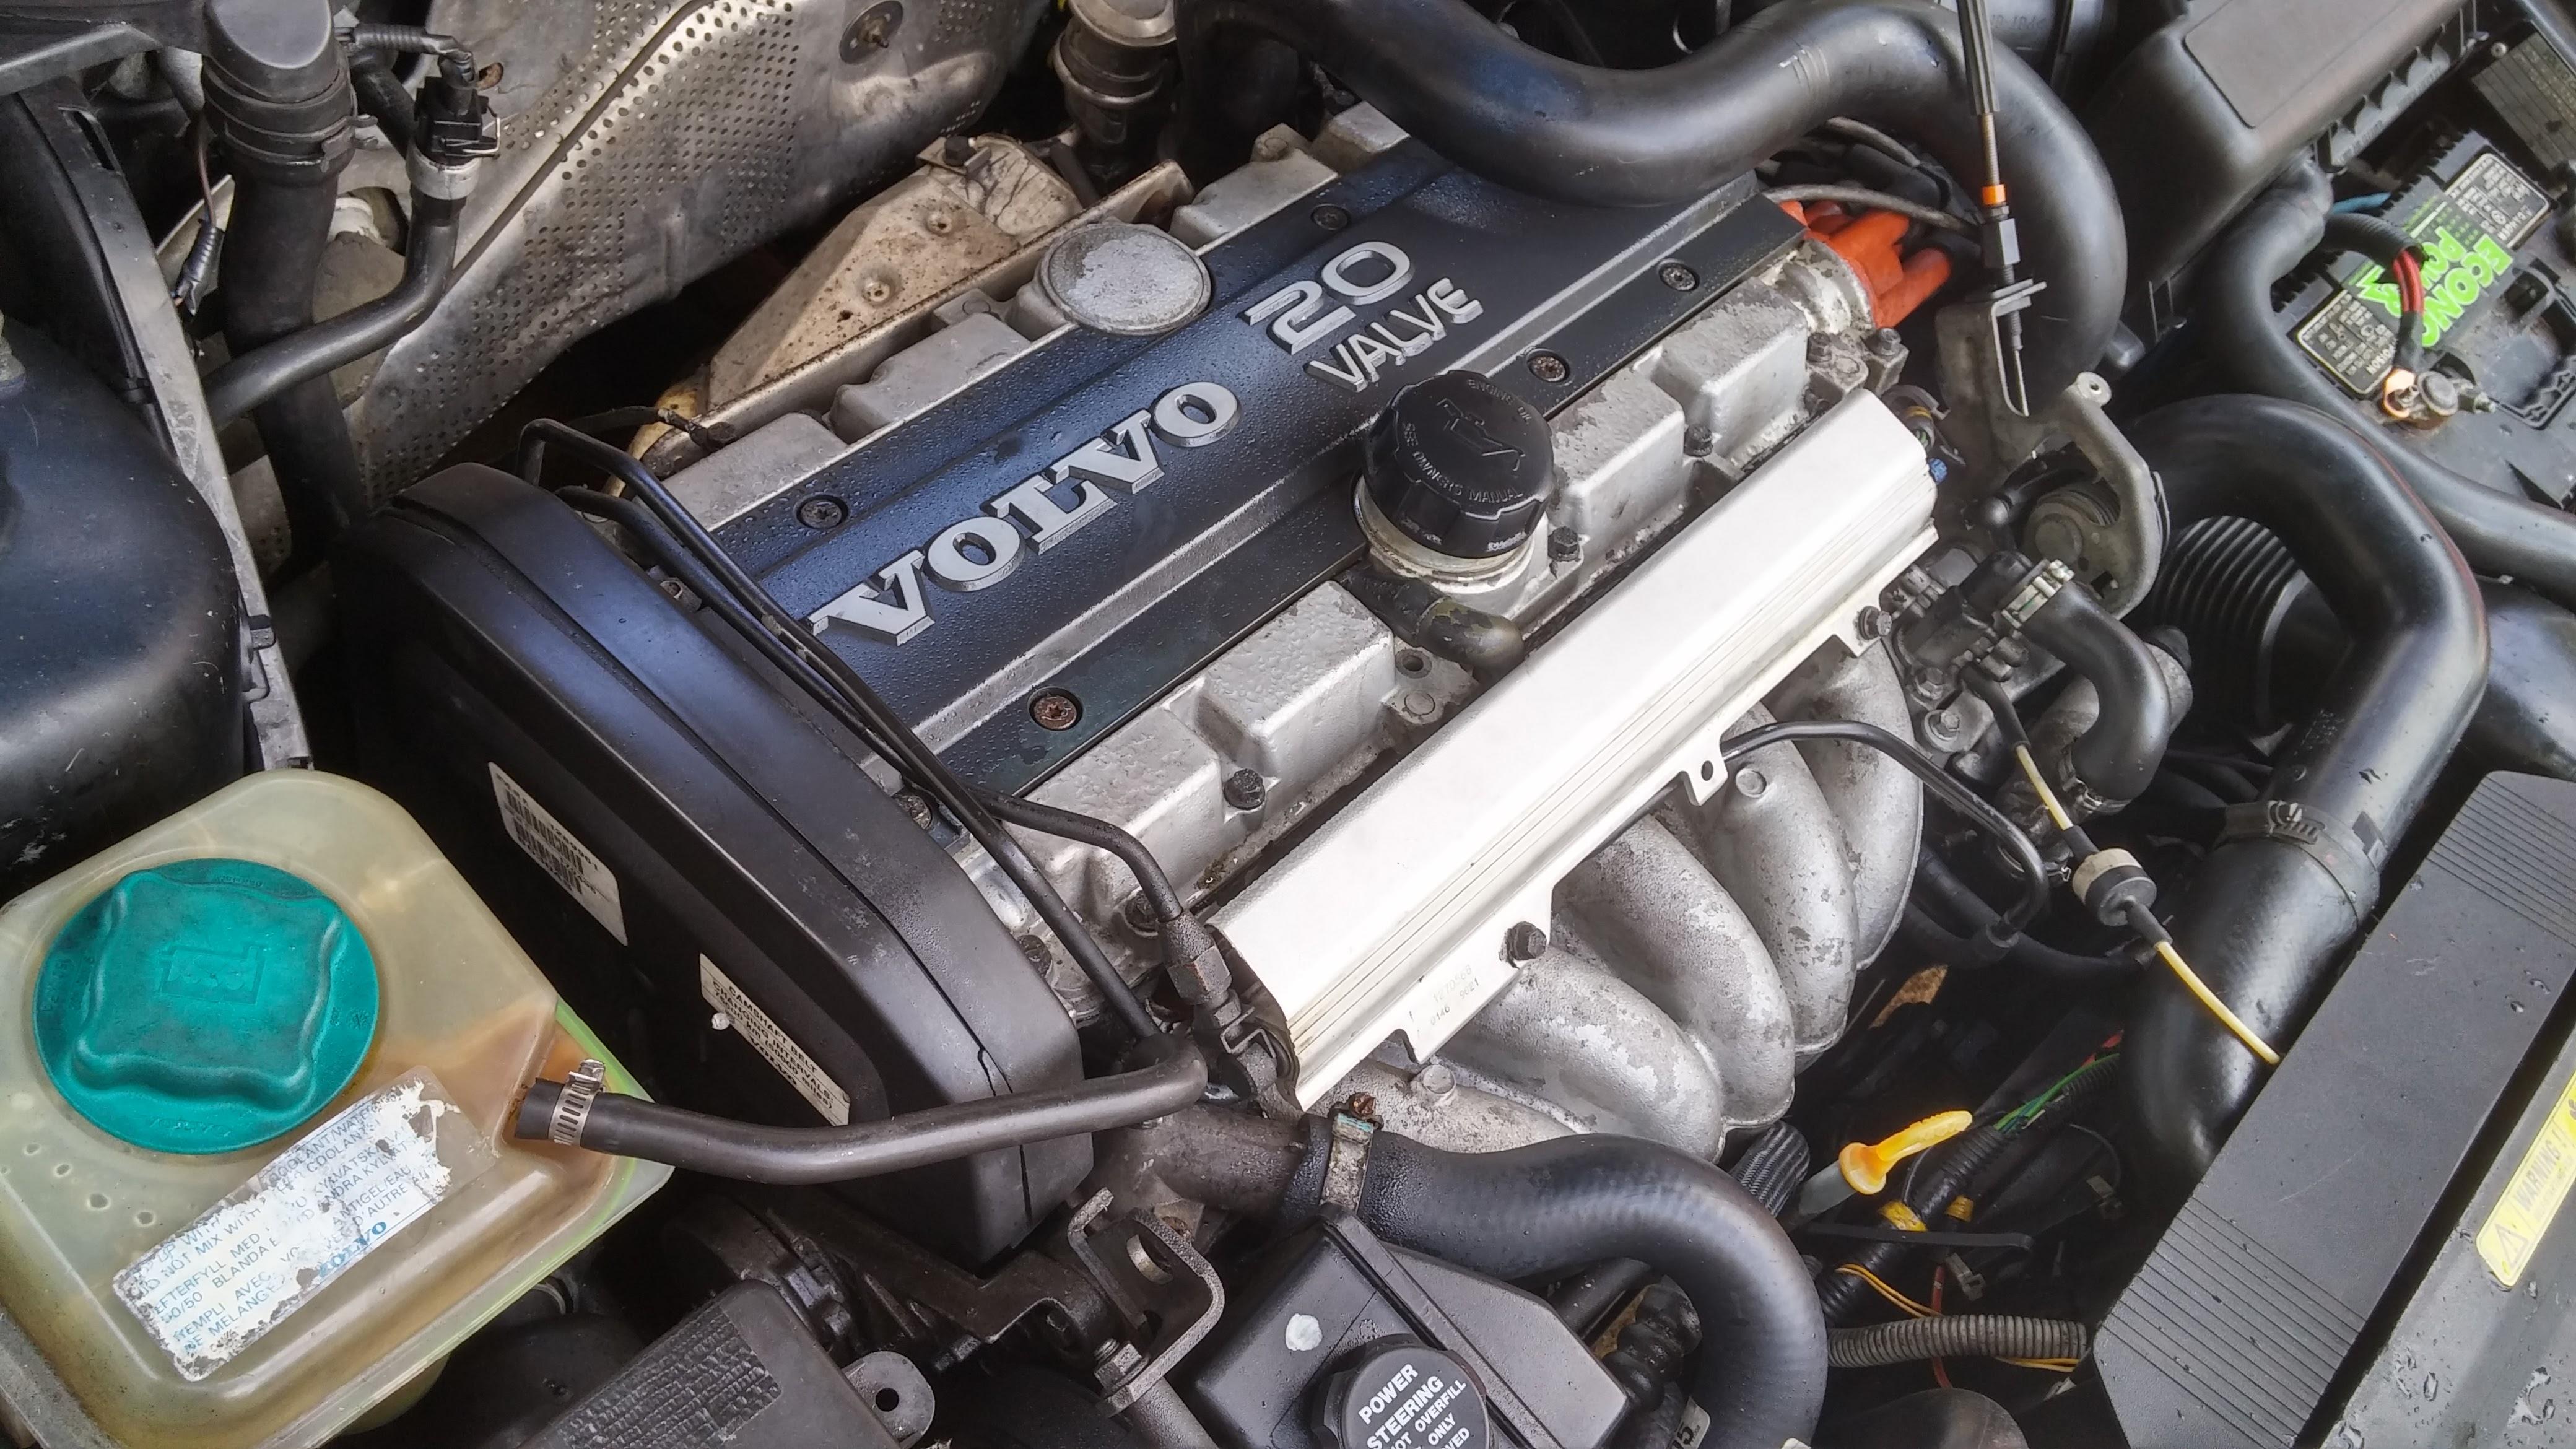 Volvo S60 Engine Bay Diagram - Wiring Diagram Replace calf-display -  calf-display.miramontiseo.it | Volvo S60 Engine Bay Diagram |  | calf-display.miramontiseo.it